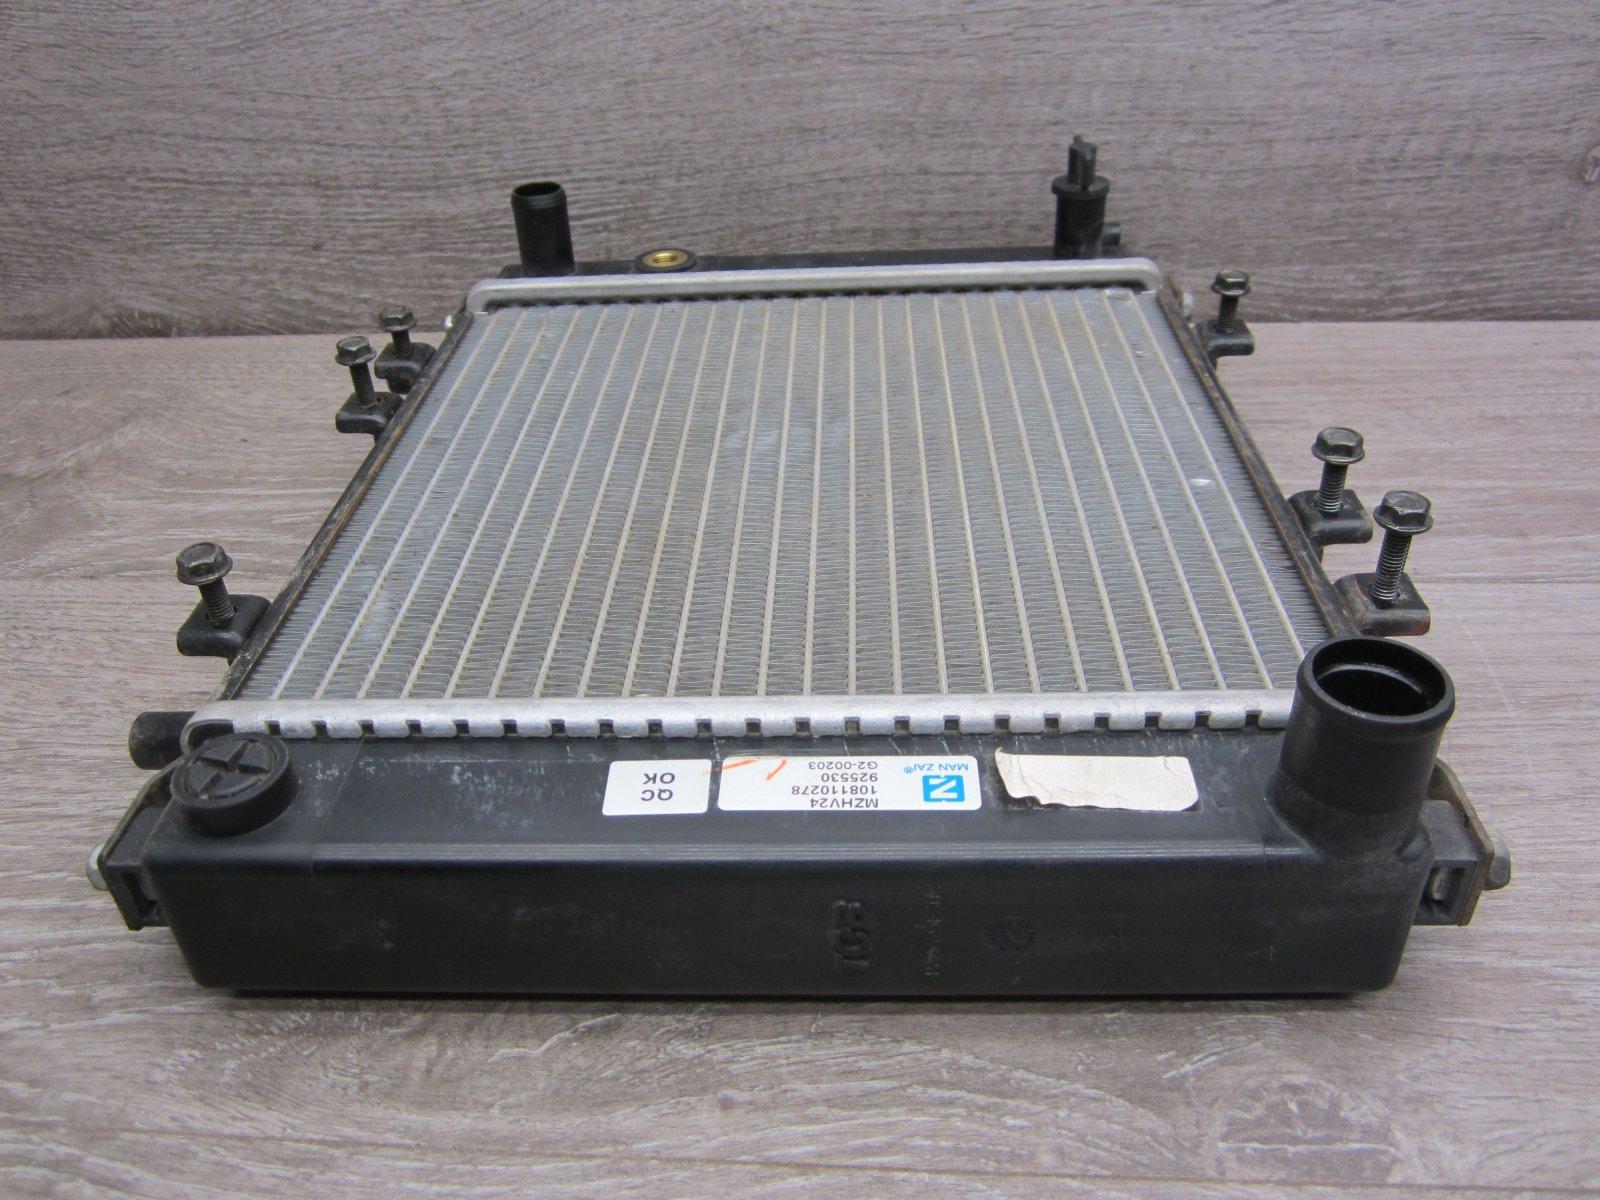 quad tgb target gunner 500 525 550 radiateur refroidisseur d 39 eau tgb d9900052. Black Bedroom Furniture Sets. Home Design Ideas